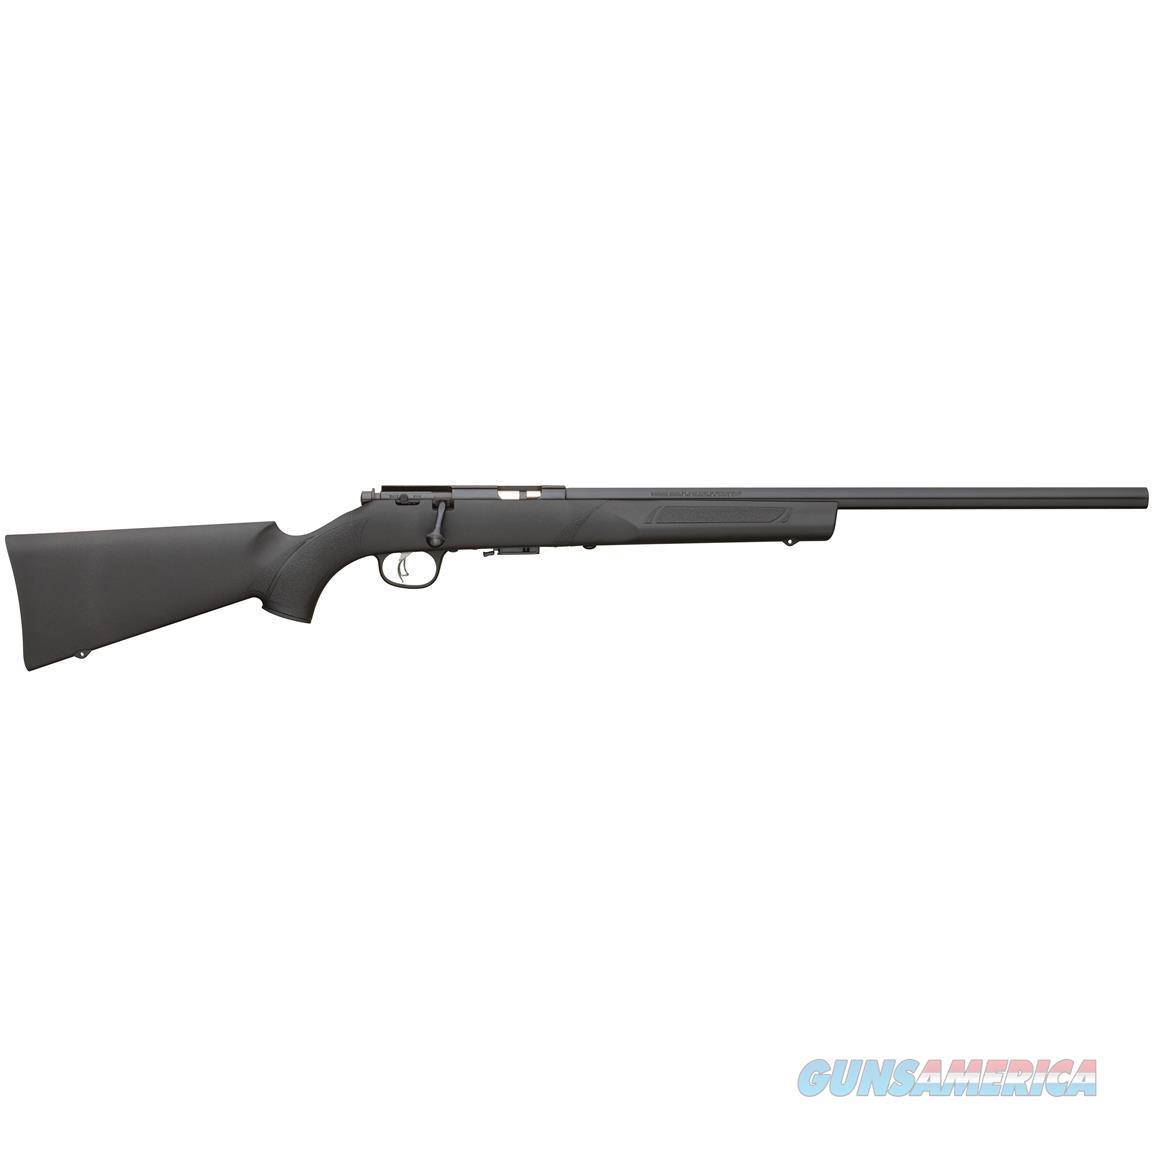 MARLIN XT-17 HMR HEAVY BARREL NIB FREE SHIPPING  Guns > Rifles > Marlin Rifles > Modern > Bolt/Pump